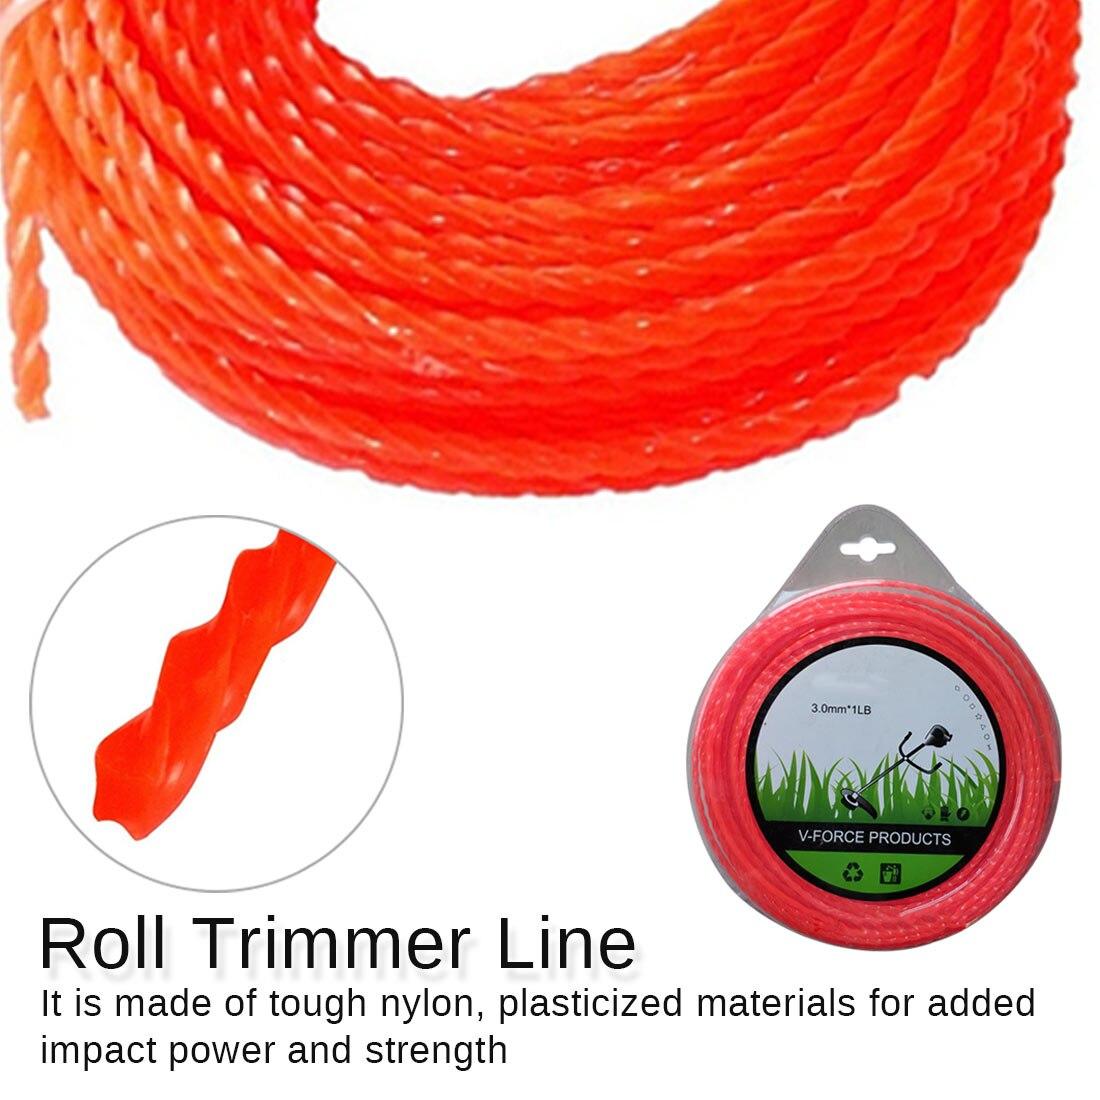 Threaded Nylon Strimmer Line 3mm Diameter Cord Grass Trimmer Line Grass Cutting Weed Cutter Trimmer Replacement Part